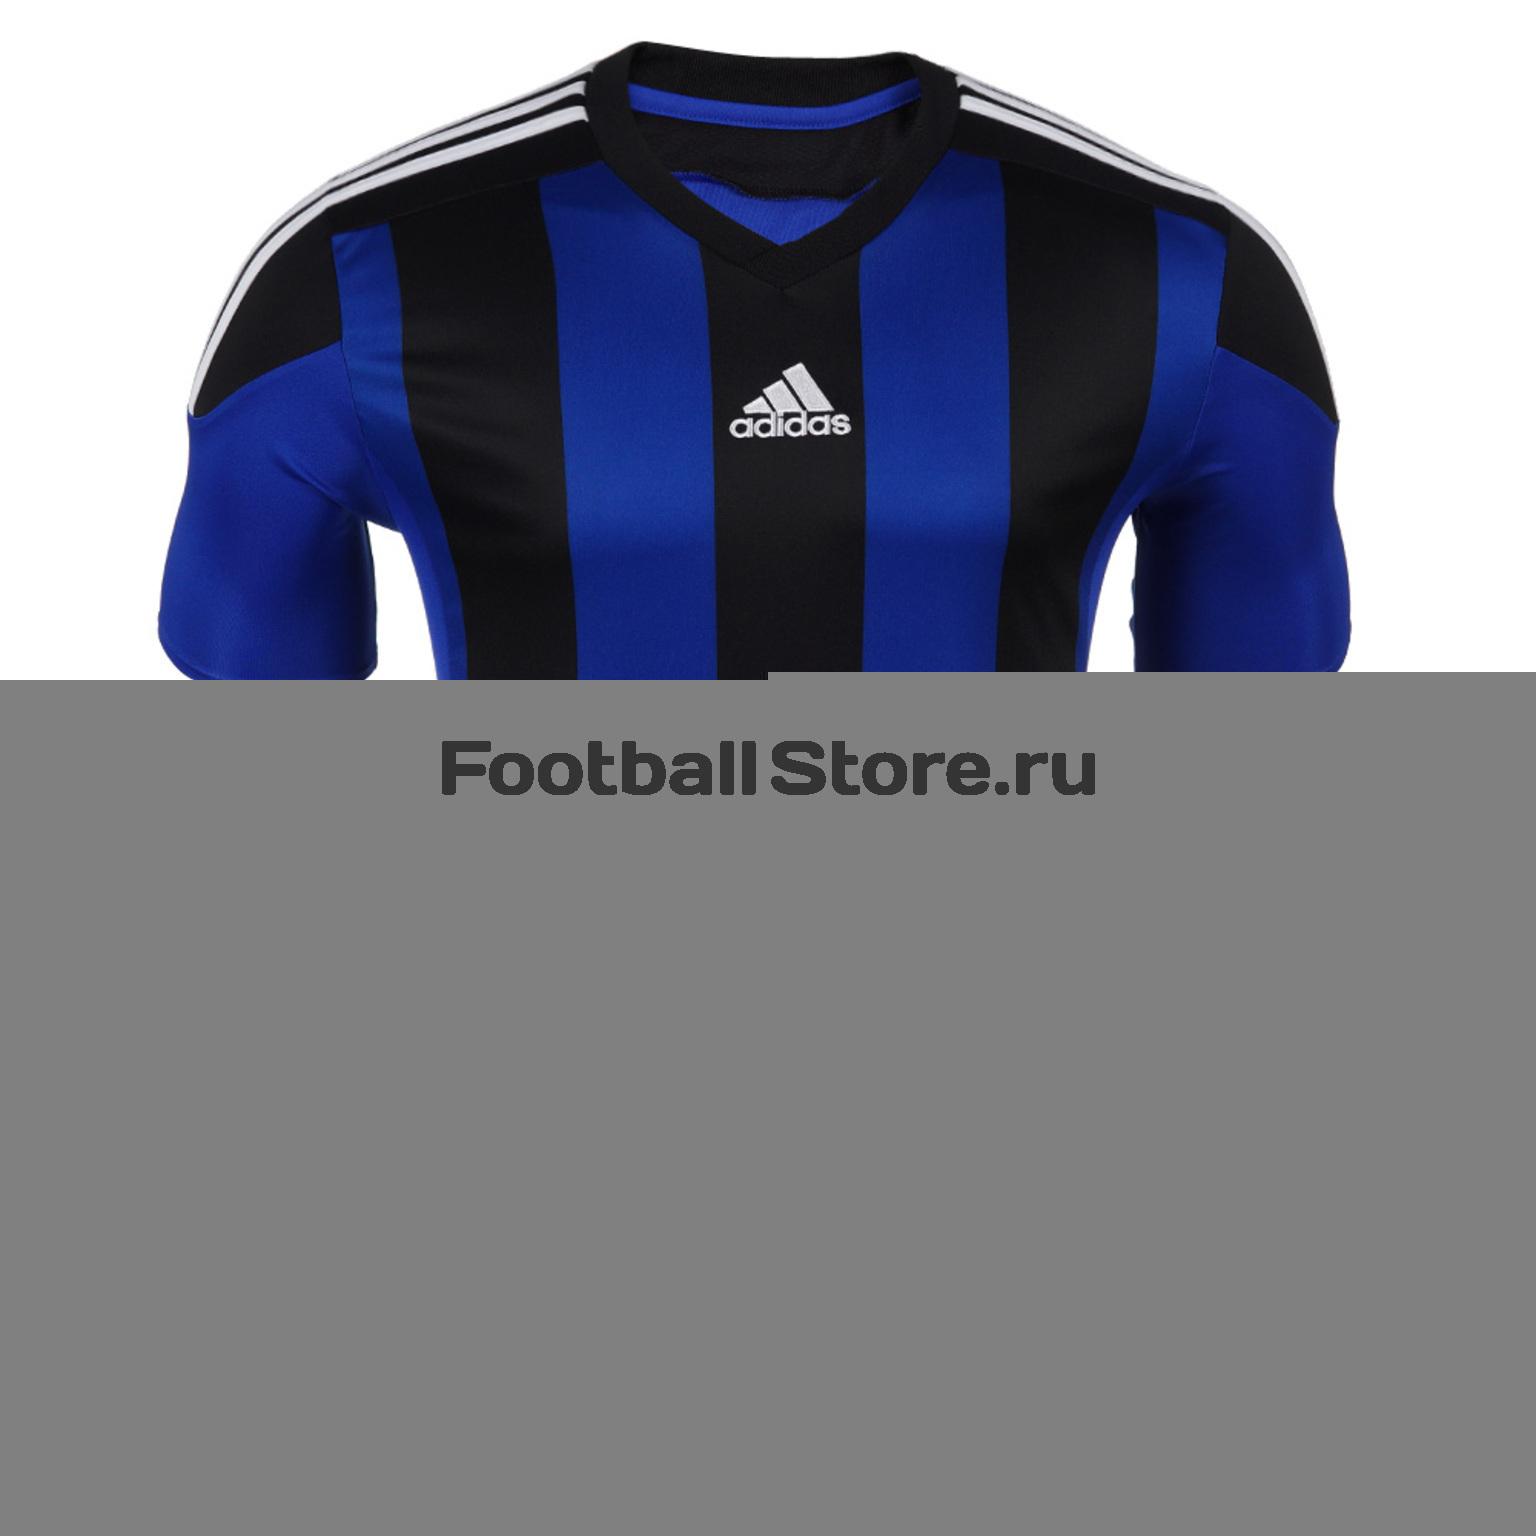 Футболка игровая Adidas Striped 15 JSY S16140